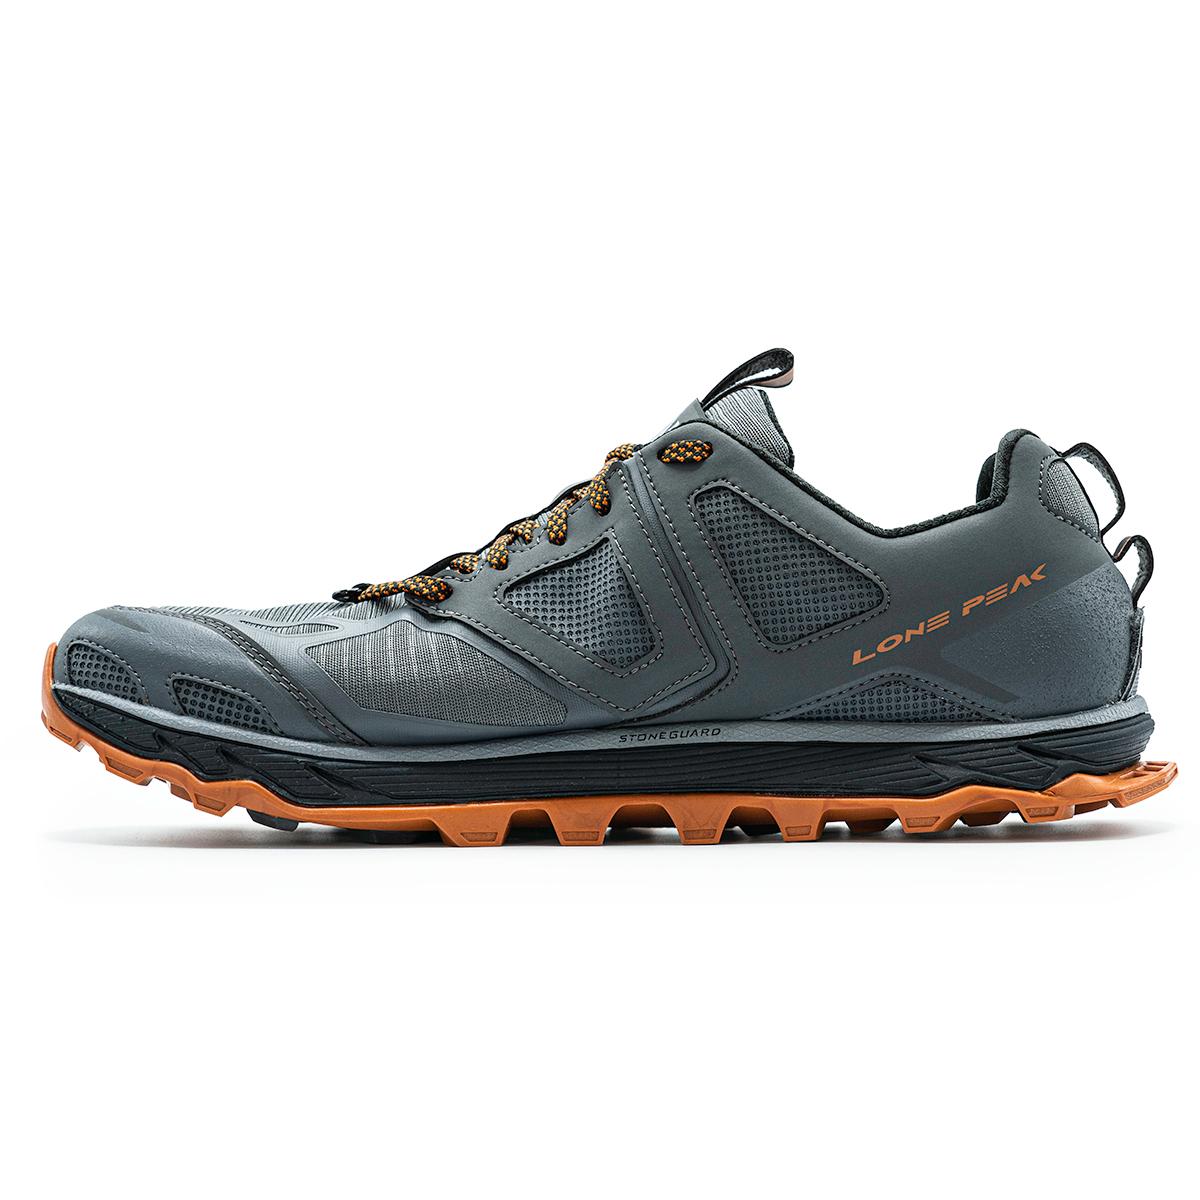 Men's Altra Lone Peak 4.5 Low Trail Running Shoe - Color: Gray/Orange - Size: 10 - Width: Regular, Gray/Orange, large, image 2